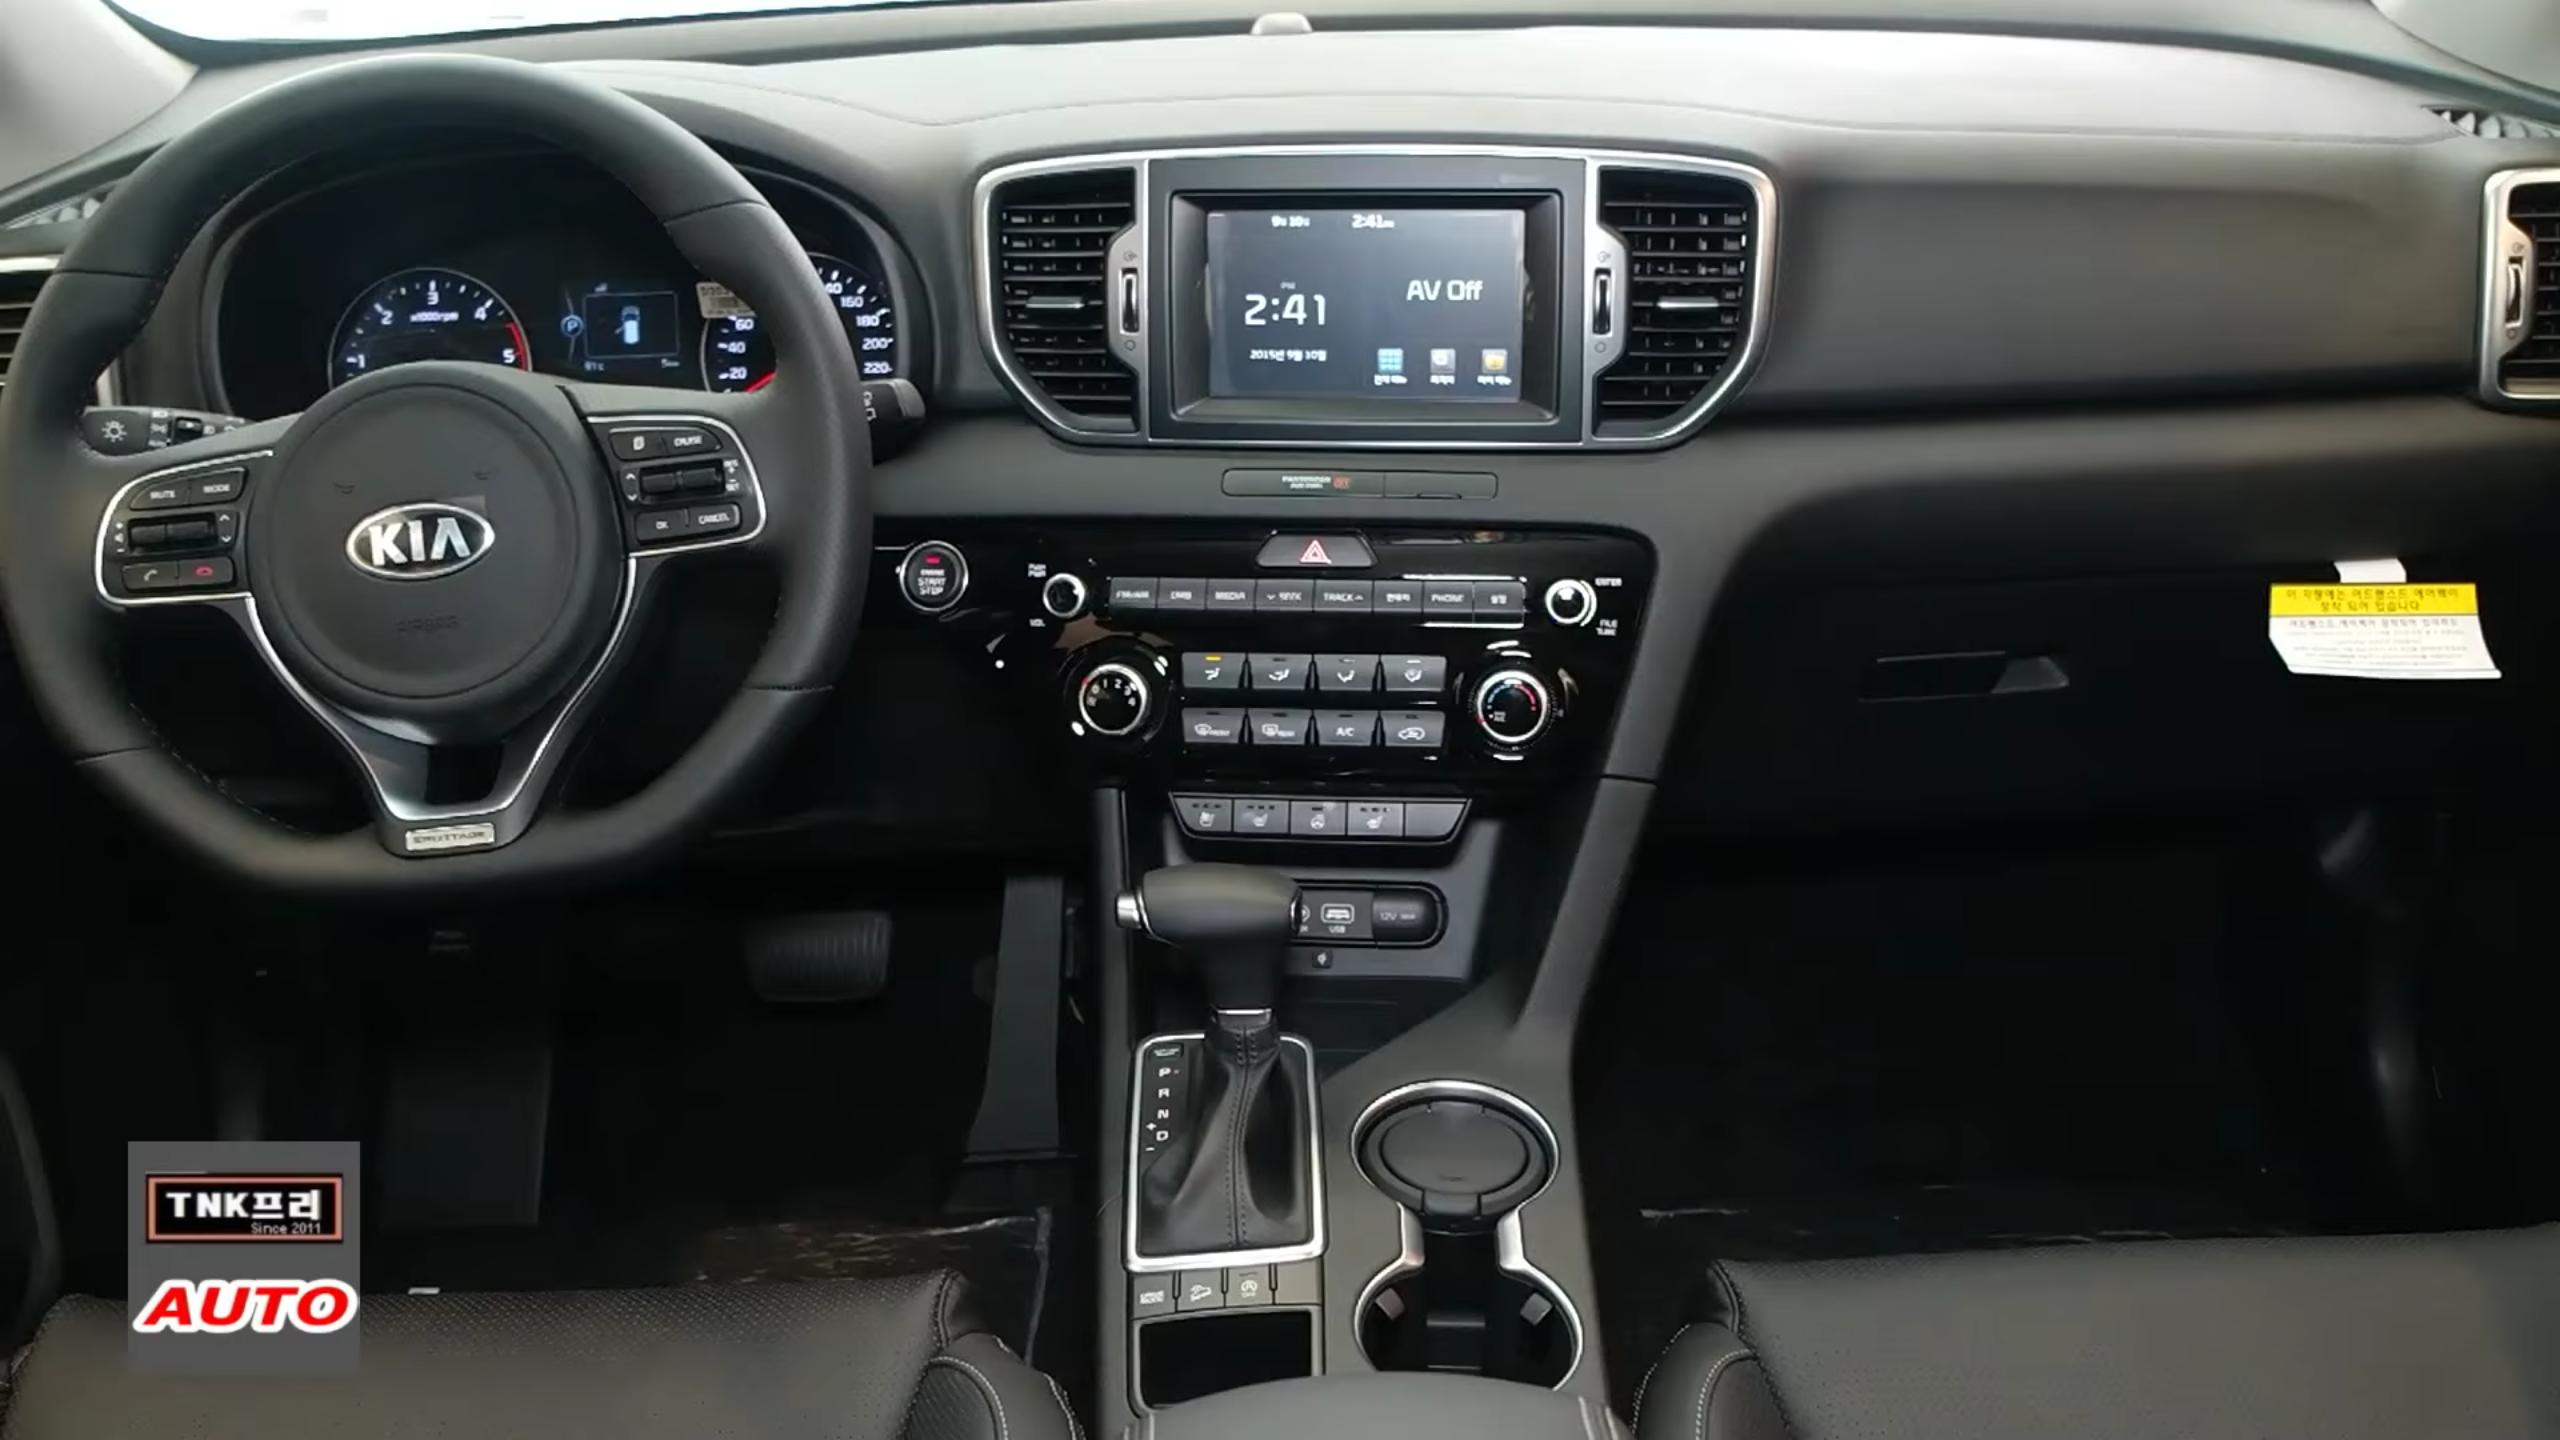 2016 Kia Sportage First Look In Video 2 Korean Car Blog